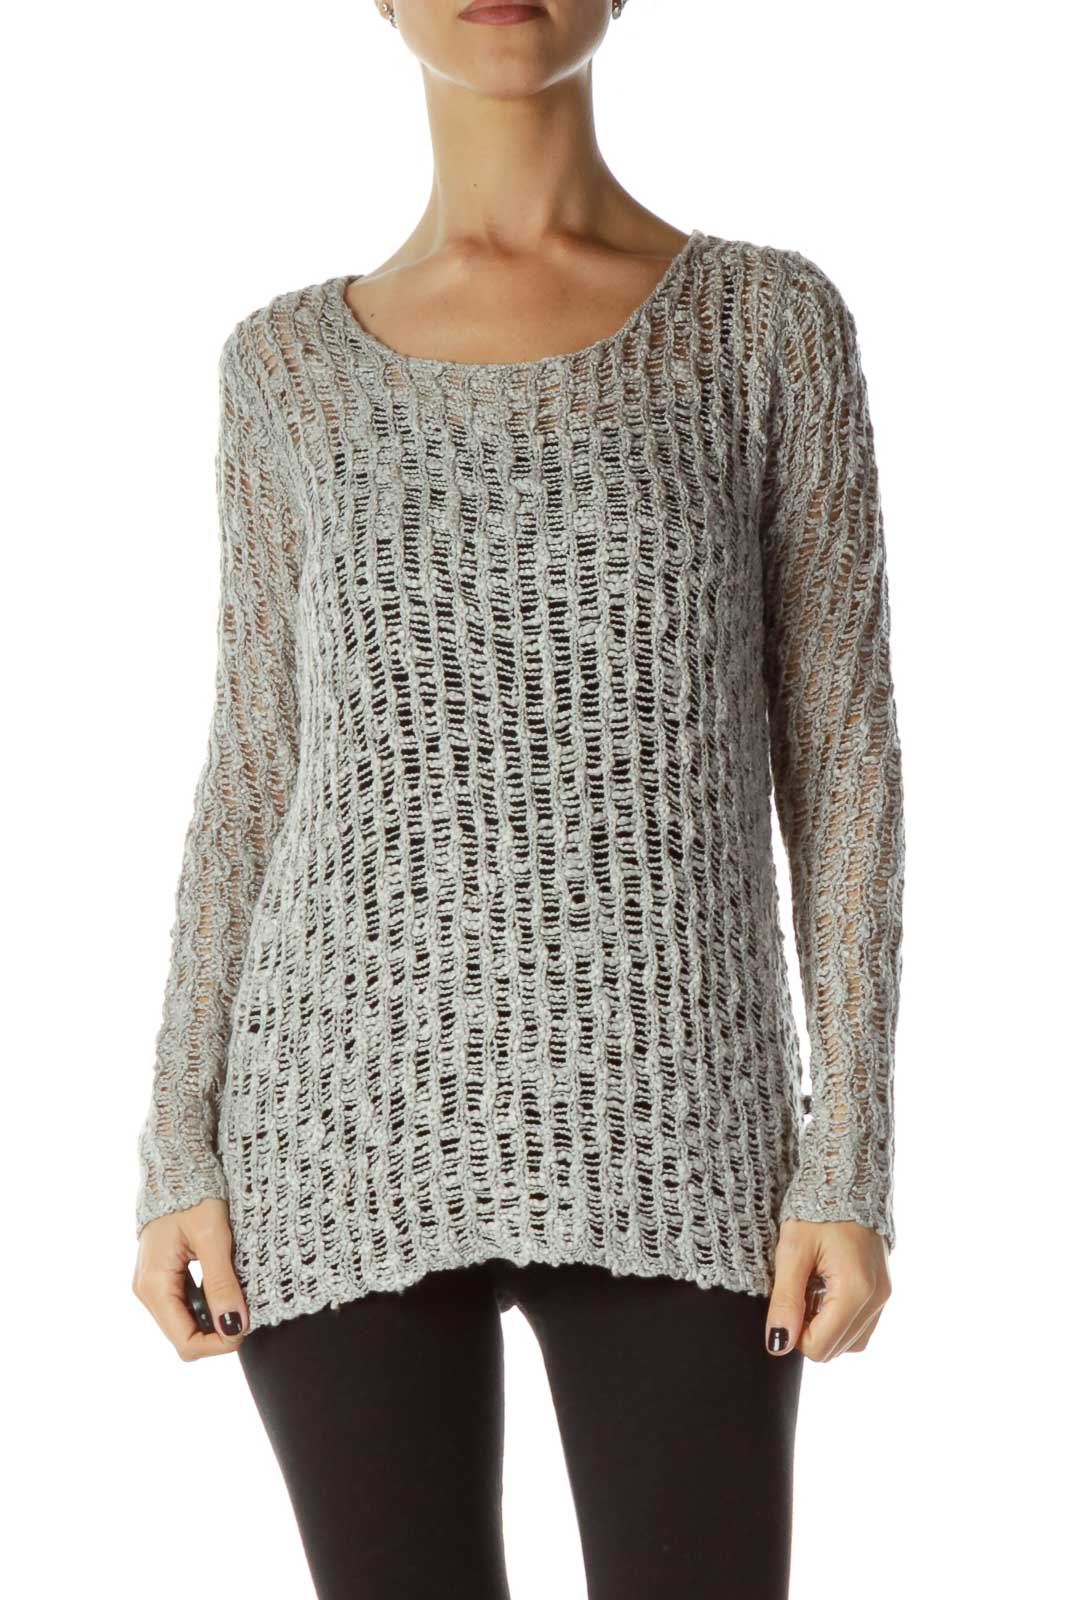 Gray Knit Sweatshirt Front